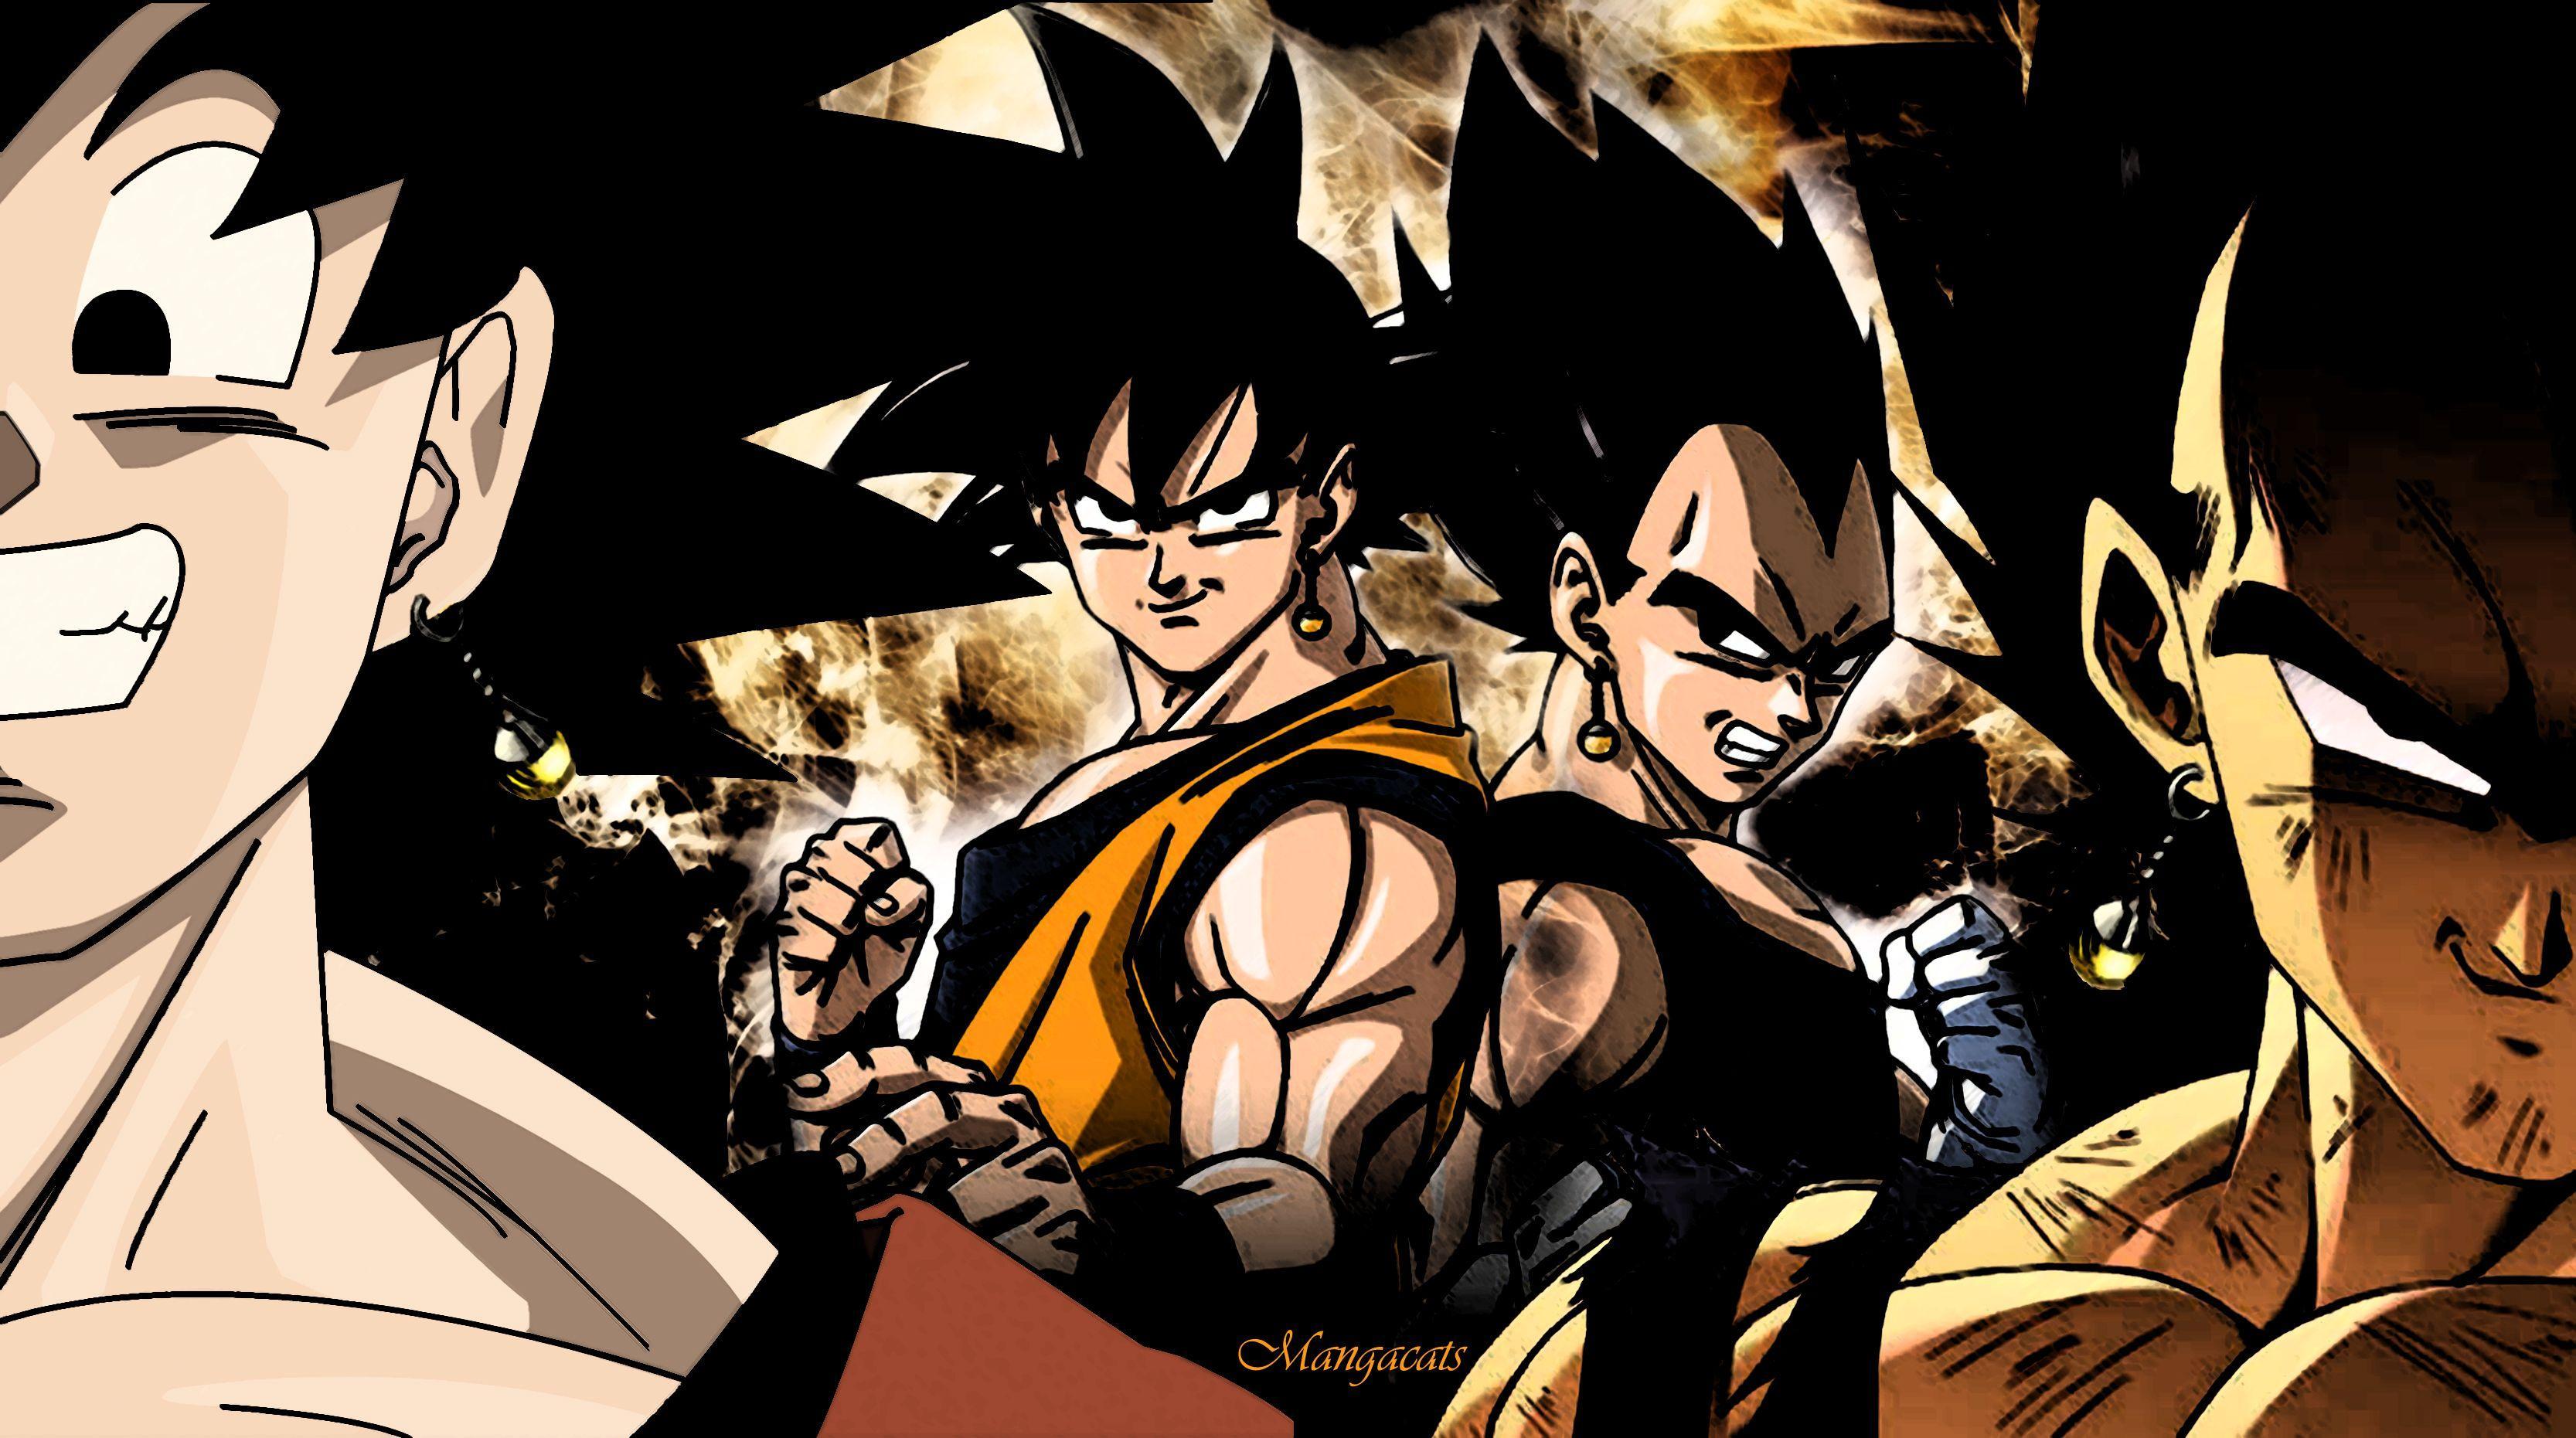 Goku And Vegeta Wallpapers Top Free Goku And Vegeta Backgrounds Wallpaperaccess